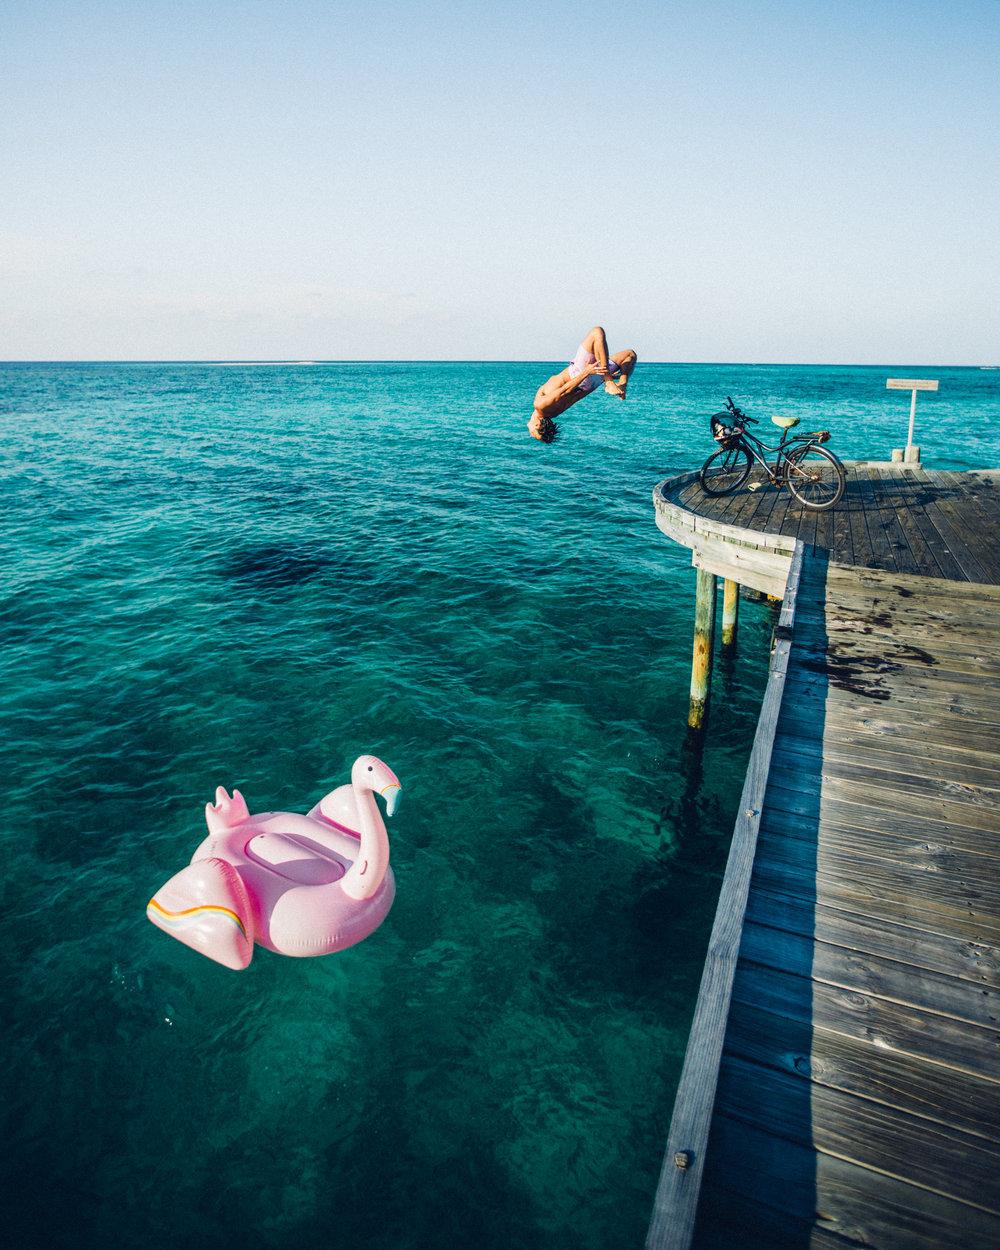 @captainbarto-AdamBartosheskyPhoto-CaptainsCamera-EvaGutowksiModel-Maldives-040317-_18661.jpg